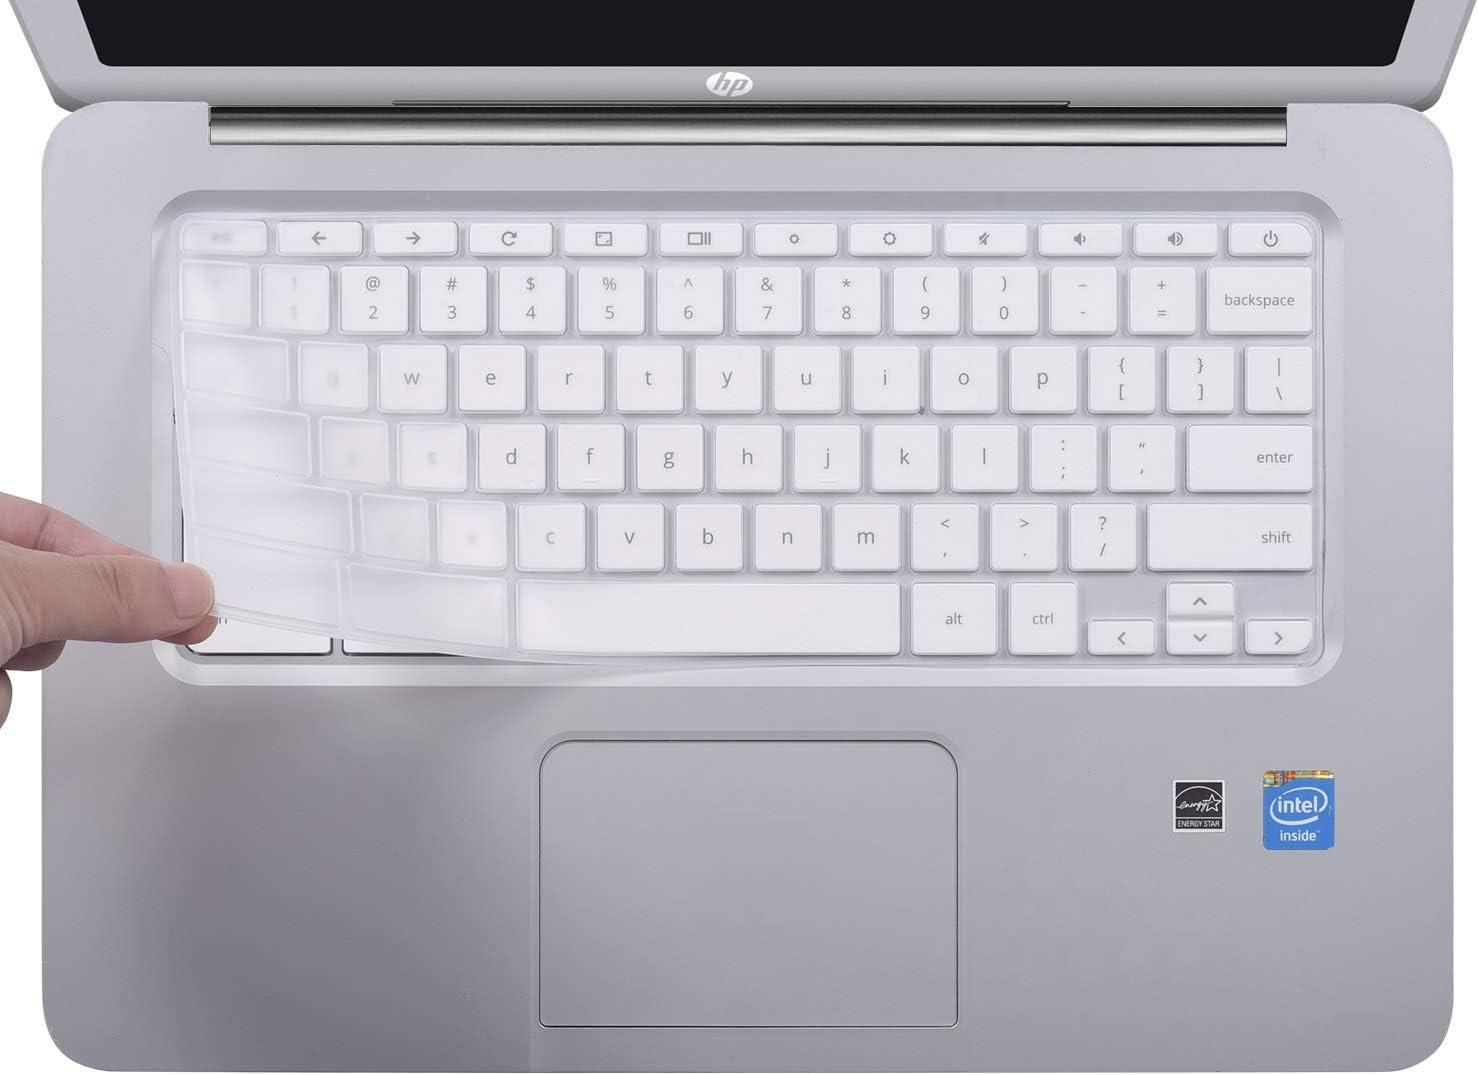 Keyboard Cover for HP 14 inch Chromebook/HP Chromebook 14-db Series/HP Chromebook 14-ca Series/HP Chromebook 14-ak Series/HP Chromebook 14 G2 G3 G4 G5, Clear